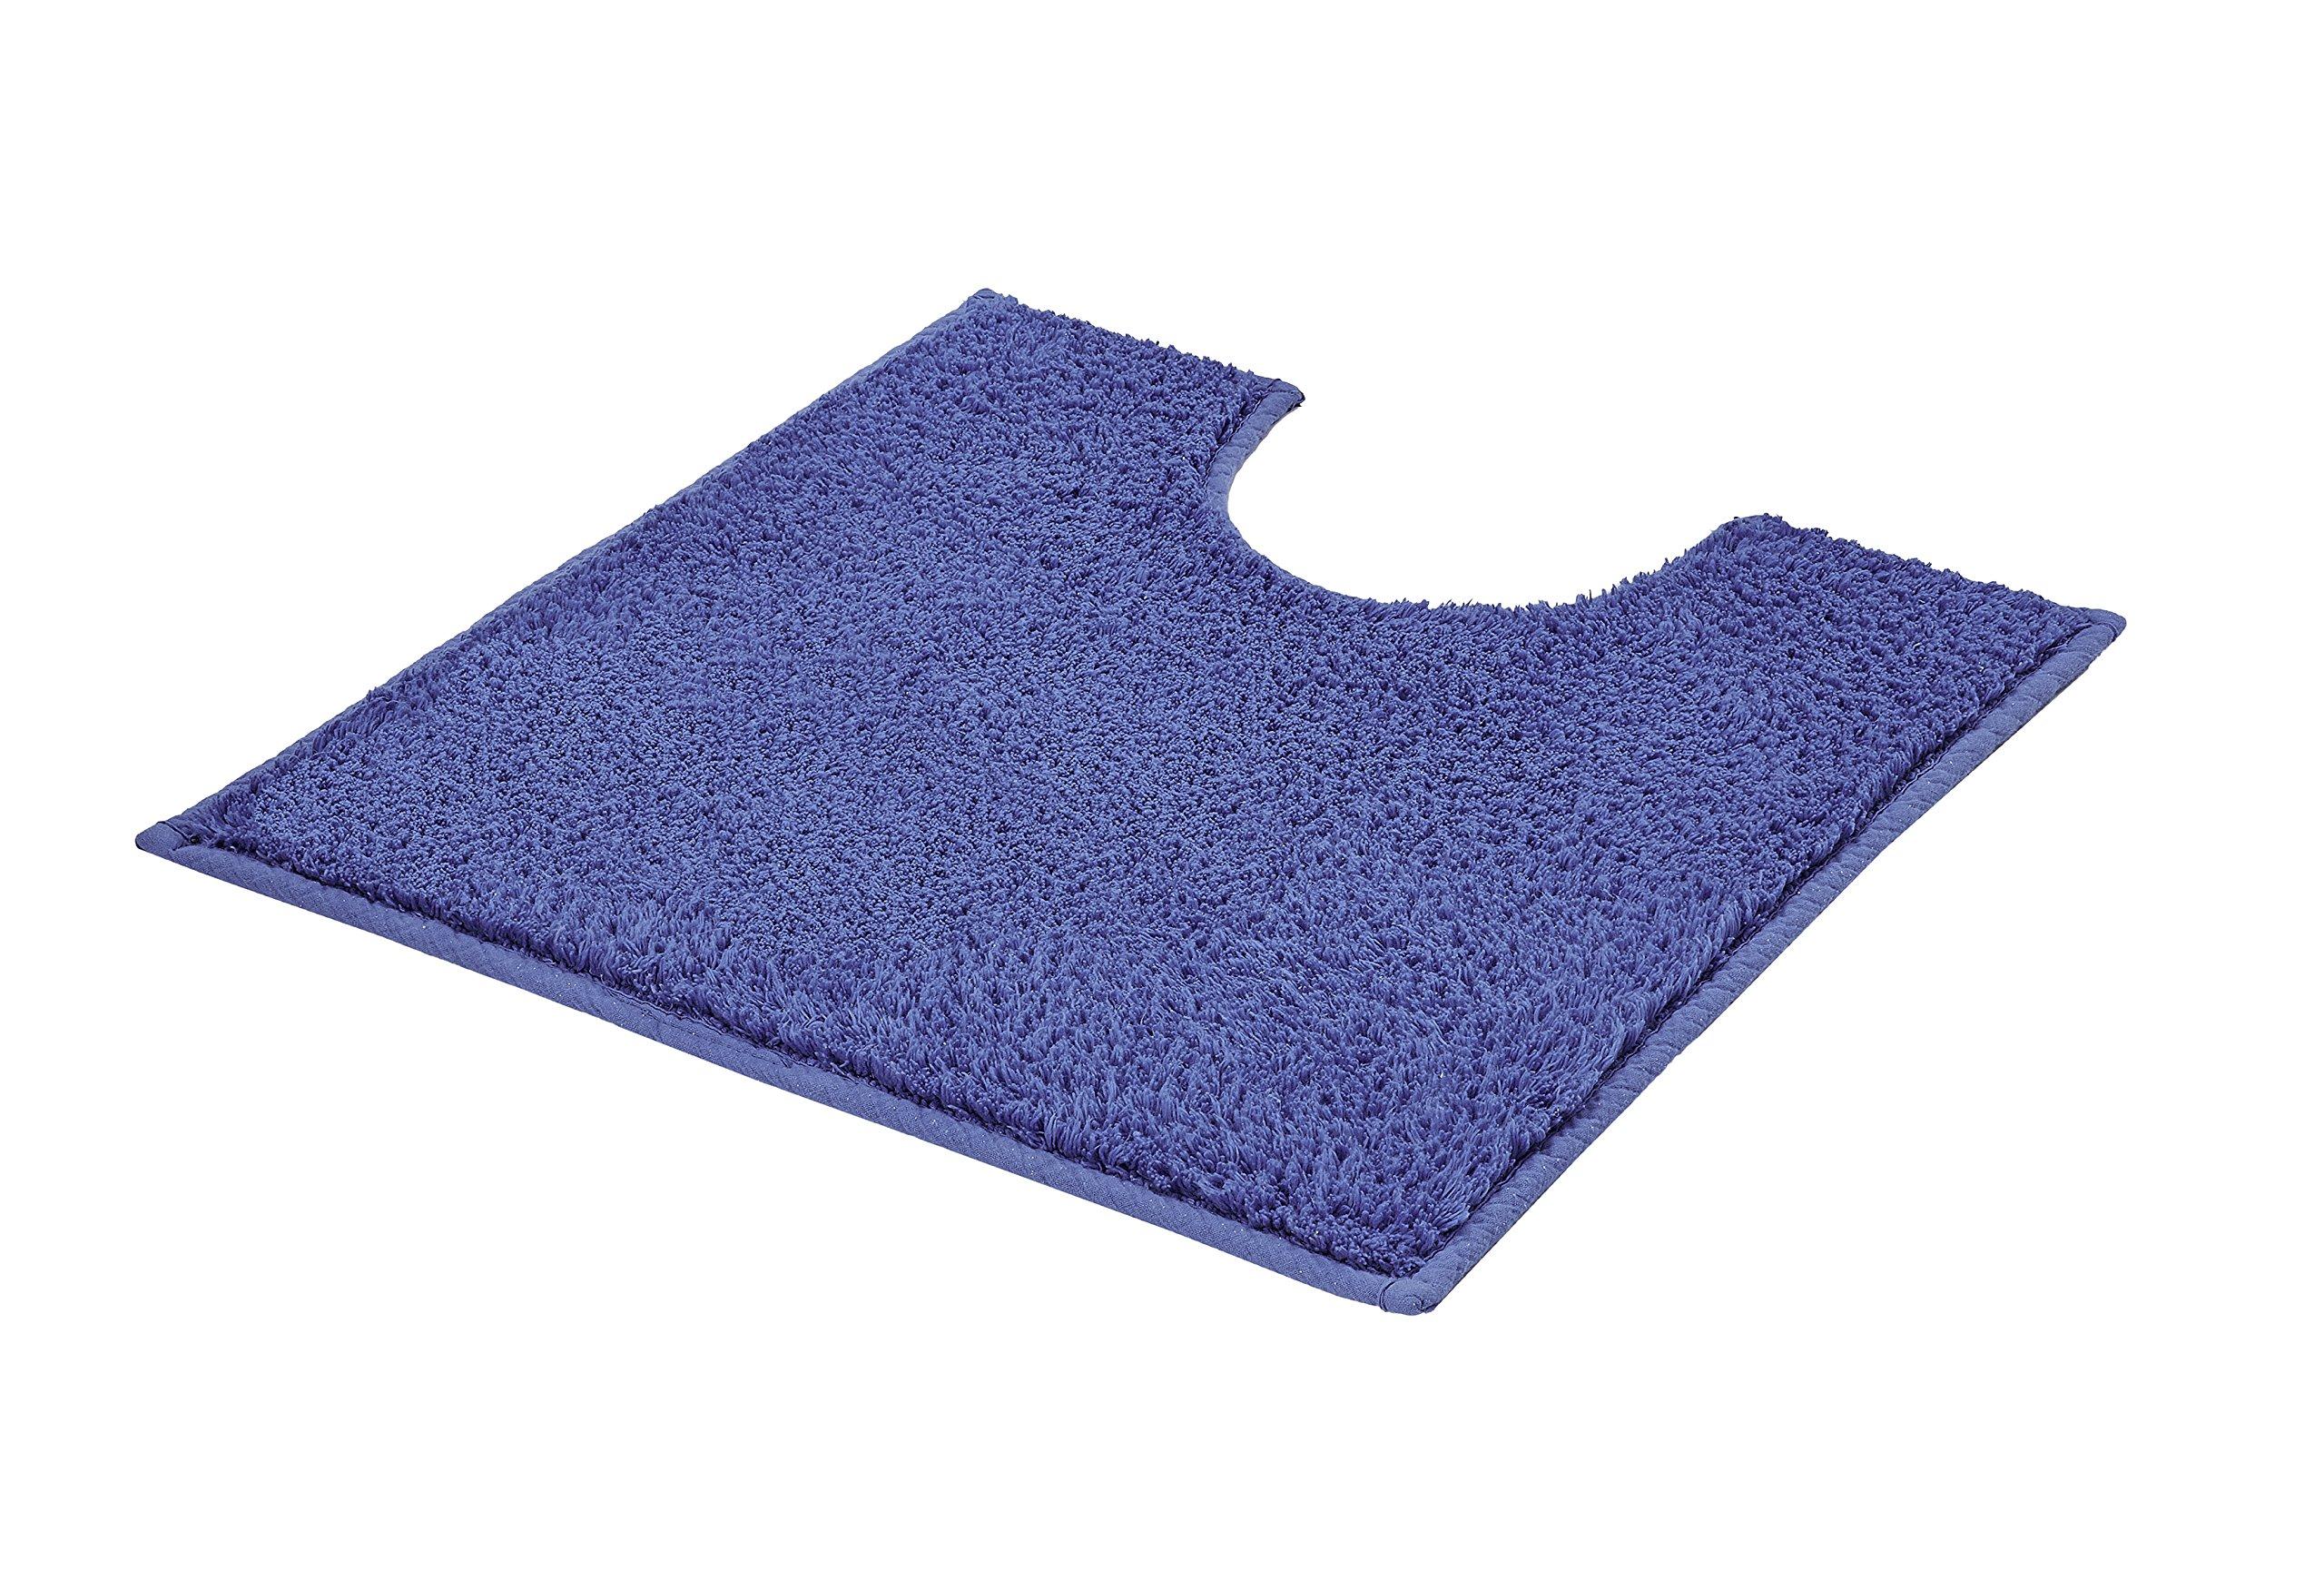 Kleine Wolke Kansas Bathroom Mat Cotton 6 Colours Available White 50 x 50 cm WC-Vorleger mit Ausschnitt Blue, Multicolor